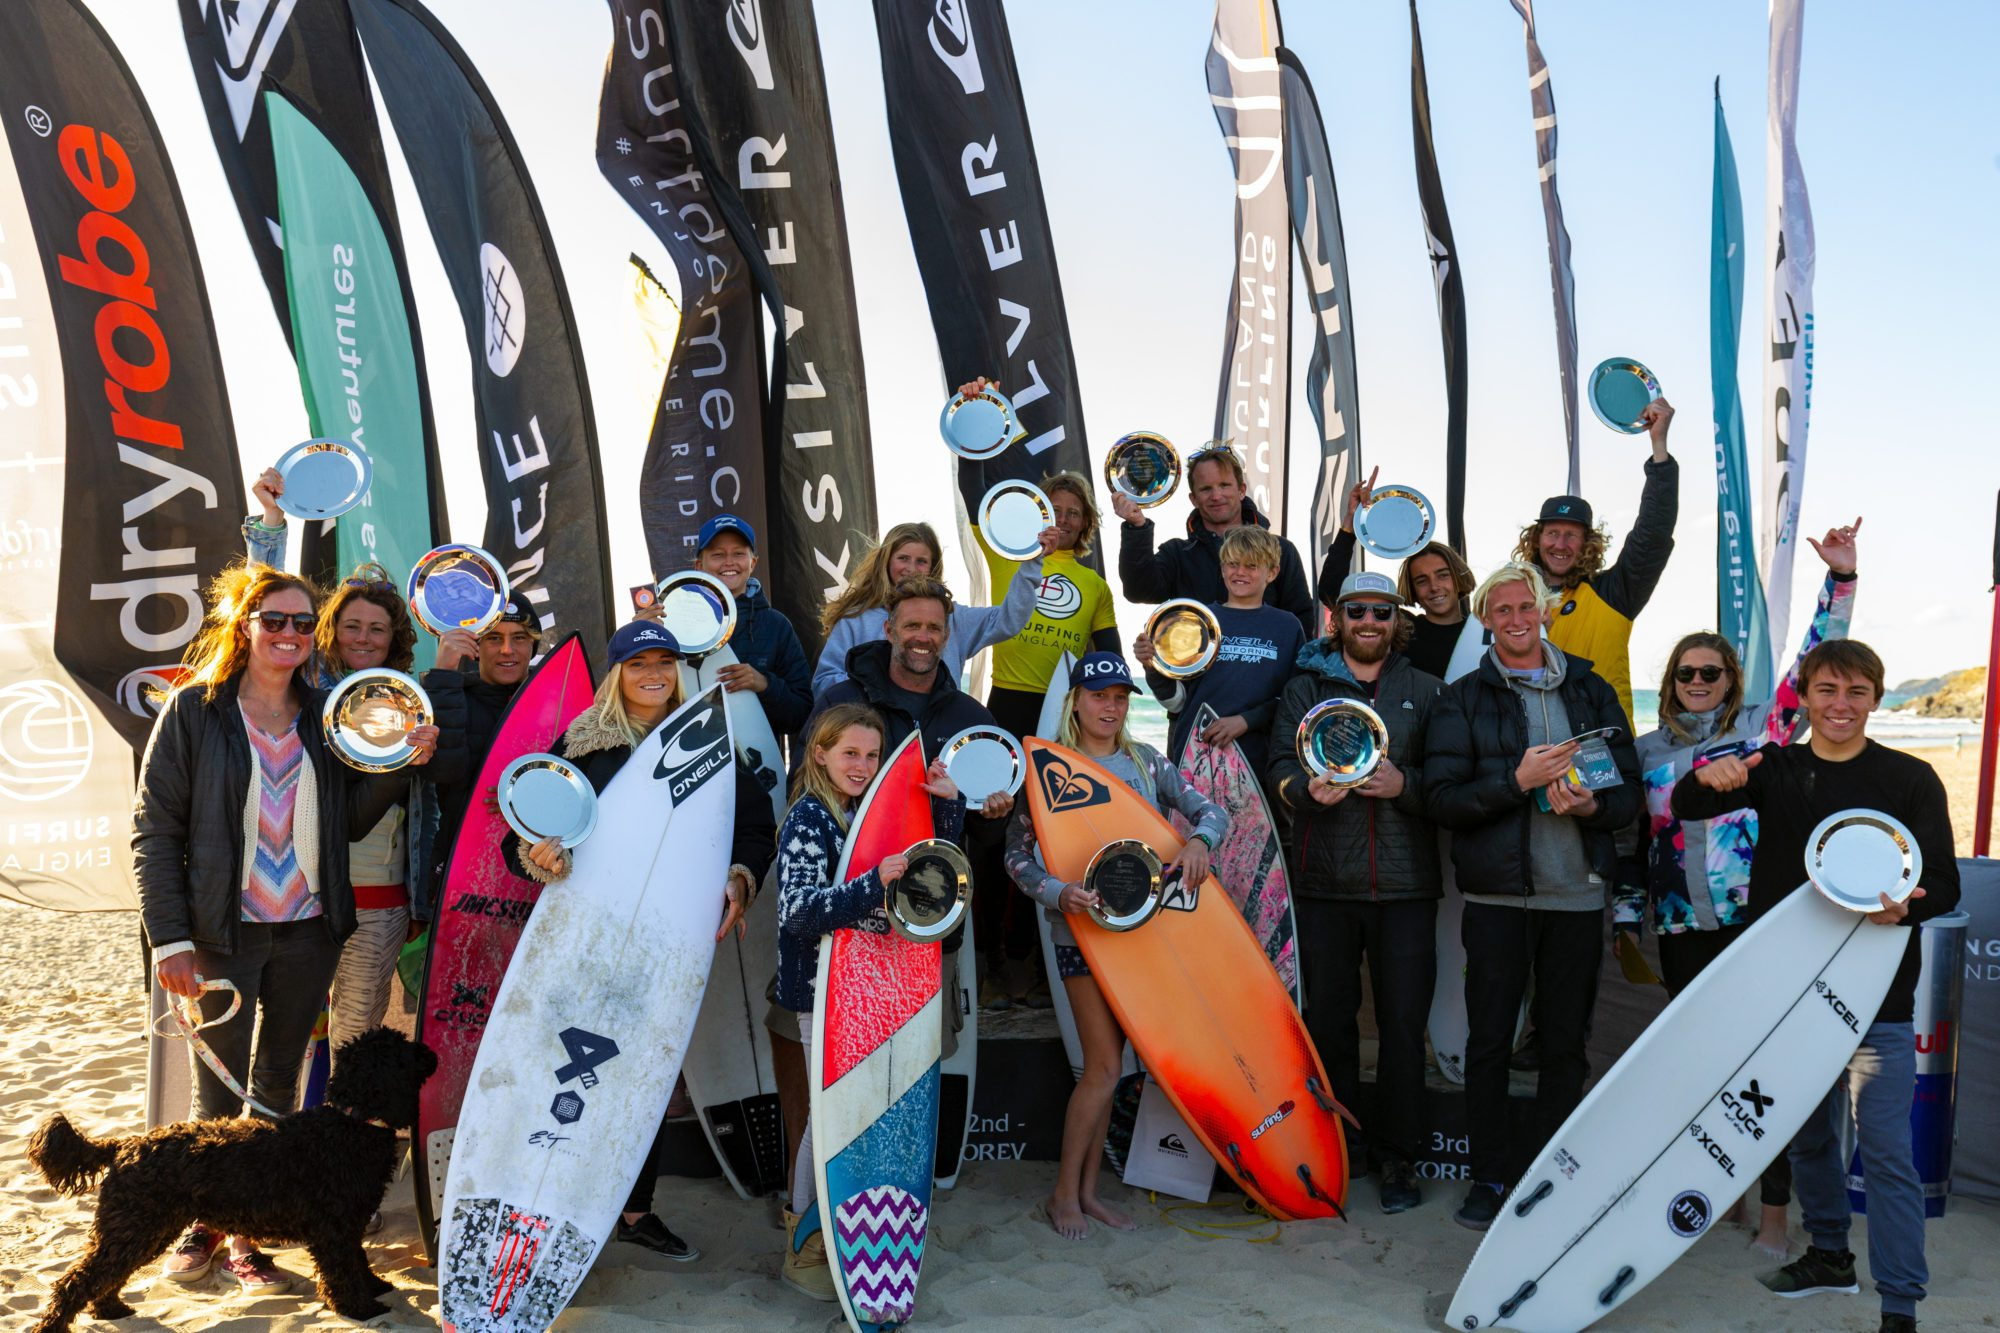 2019 English Surf Champions